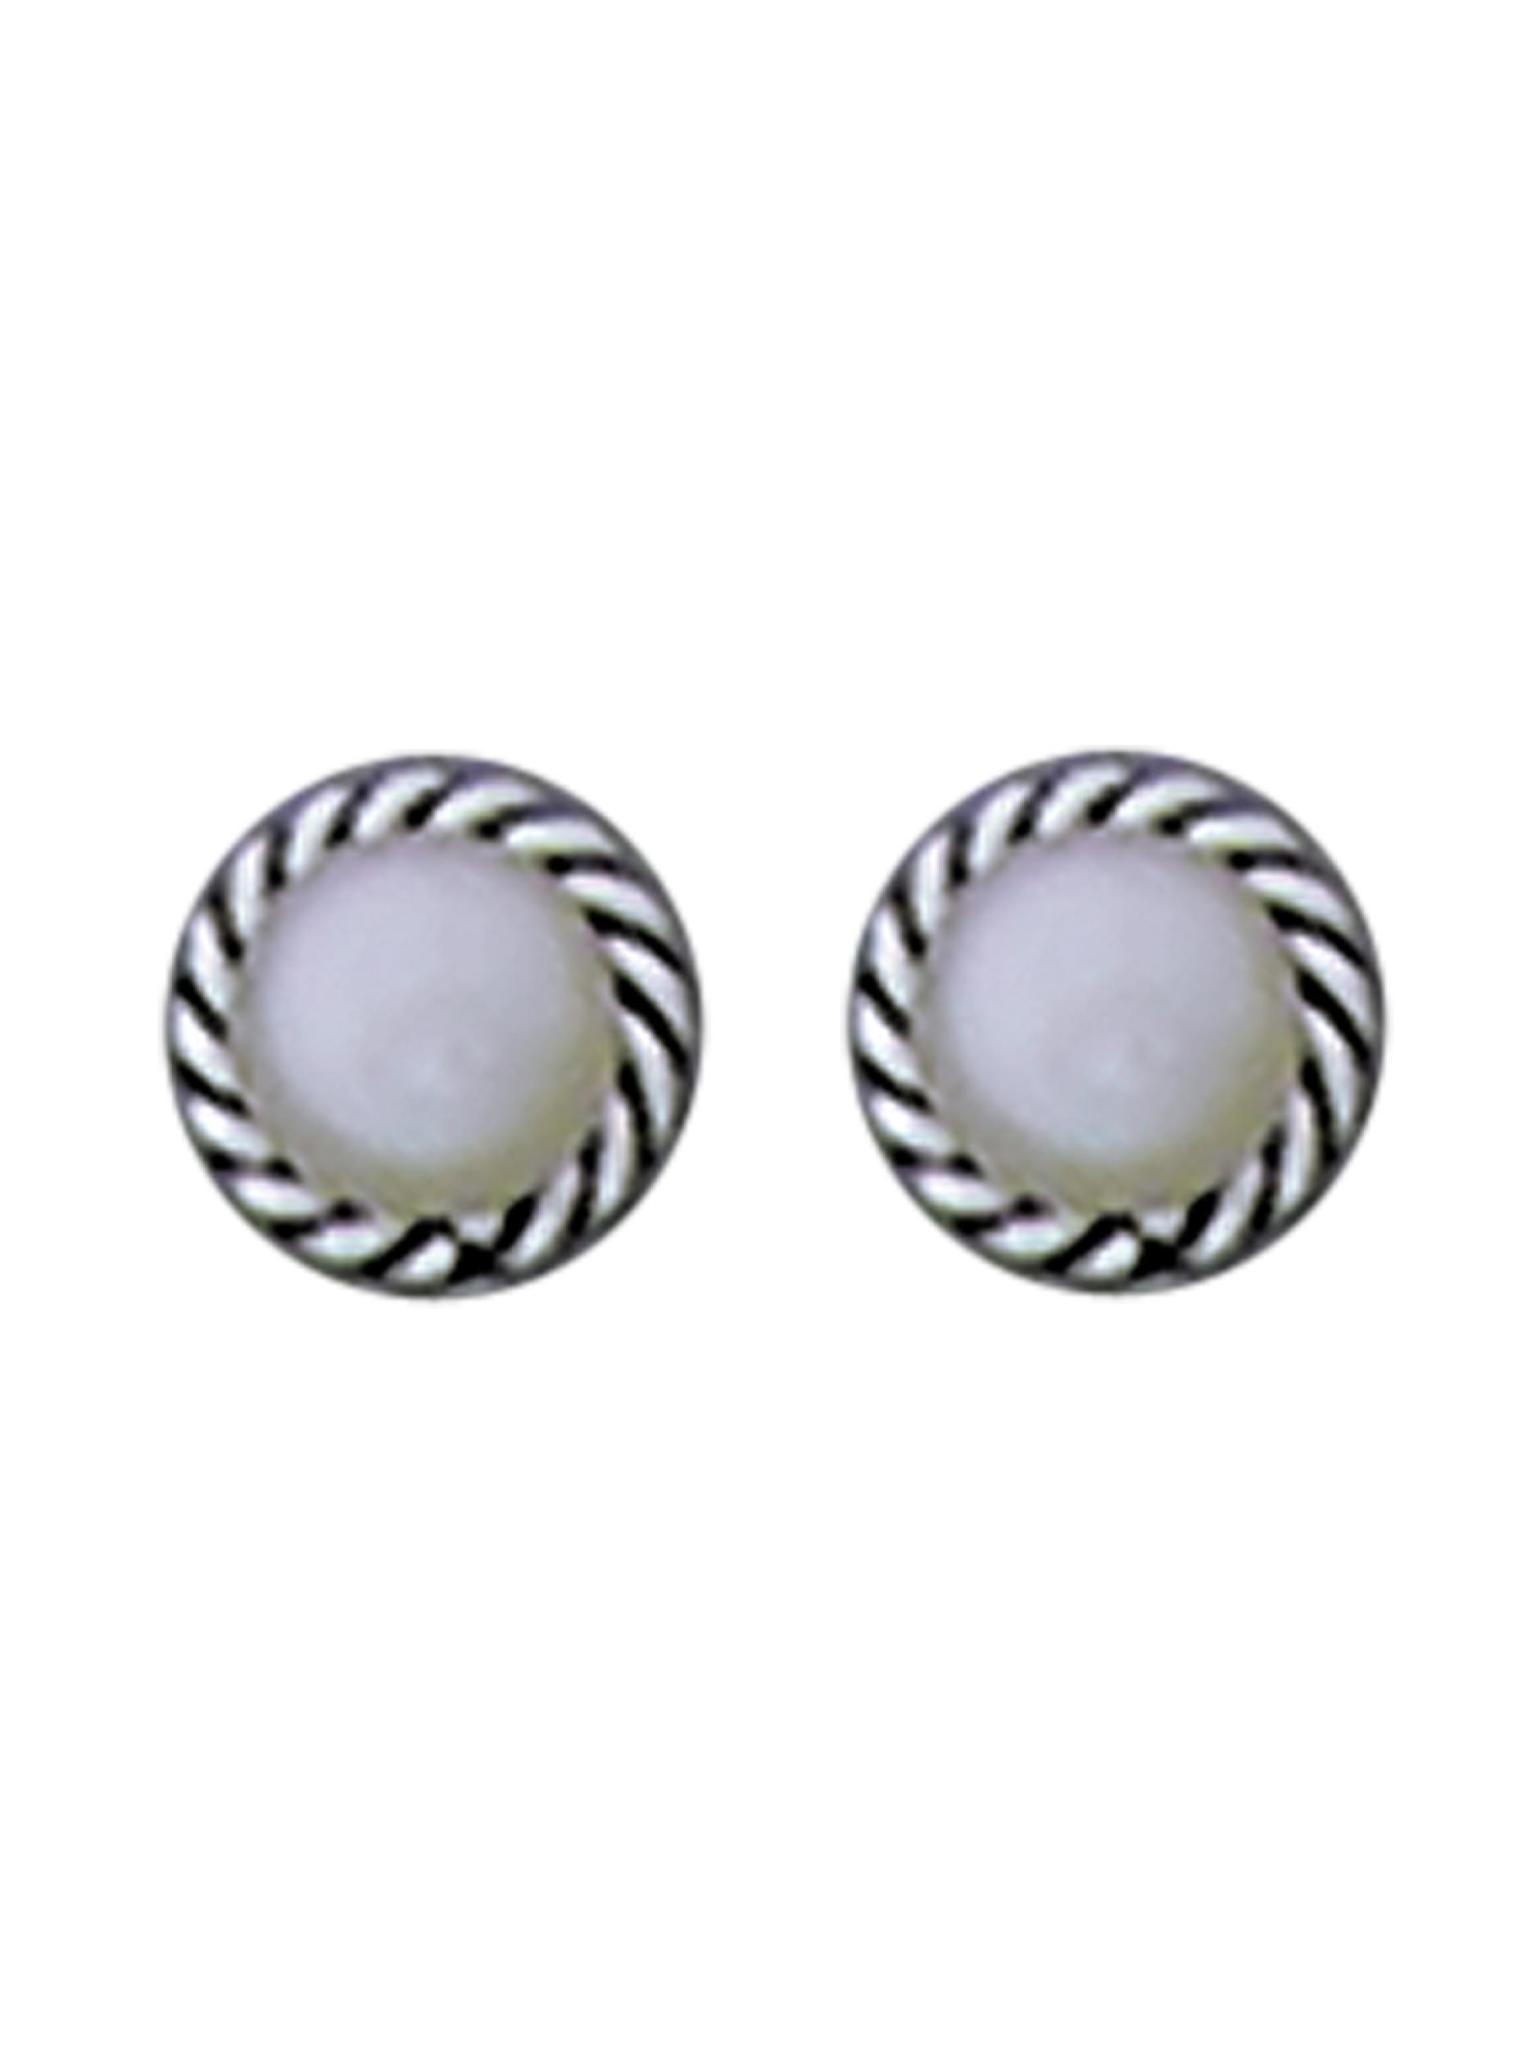 Acomo Jewelry Pearl Set in Rope Stud Earring